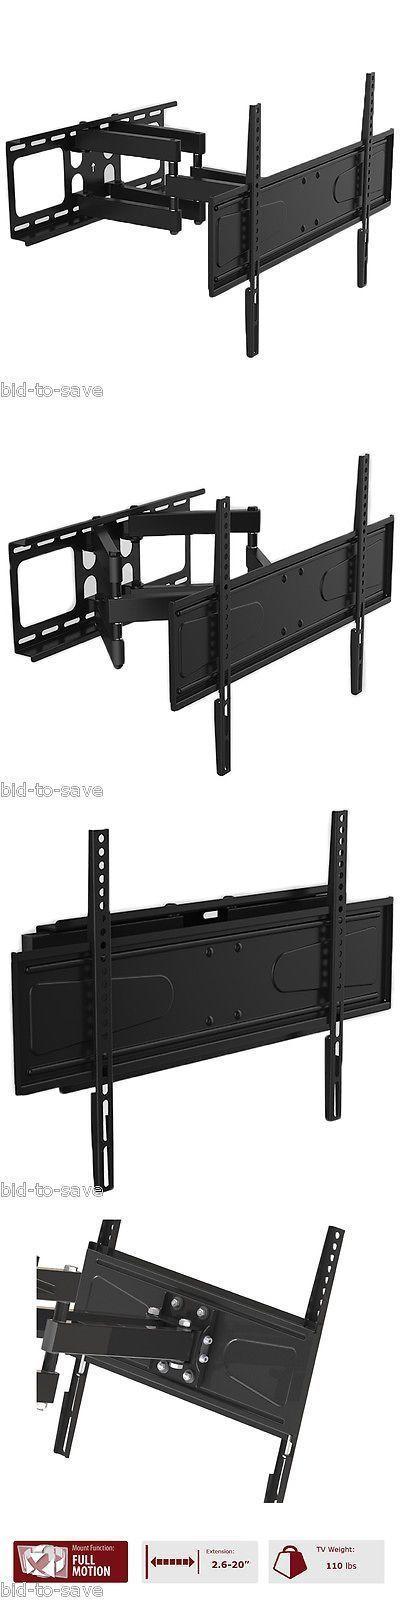 TV Mounts and Brackets: Felji Full Motion Plasma Lcd Led Tv Wall Mount 26 32 37 40 42 46 47 50 52 55 60 -> BUY IT NOW ONLY: $33.99 on eBay!